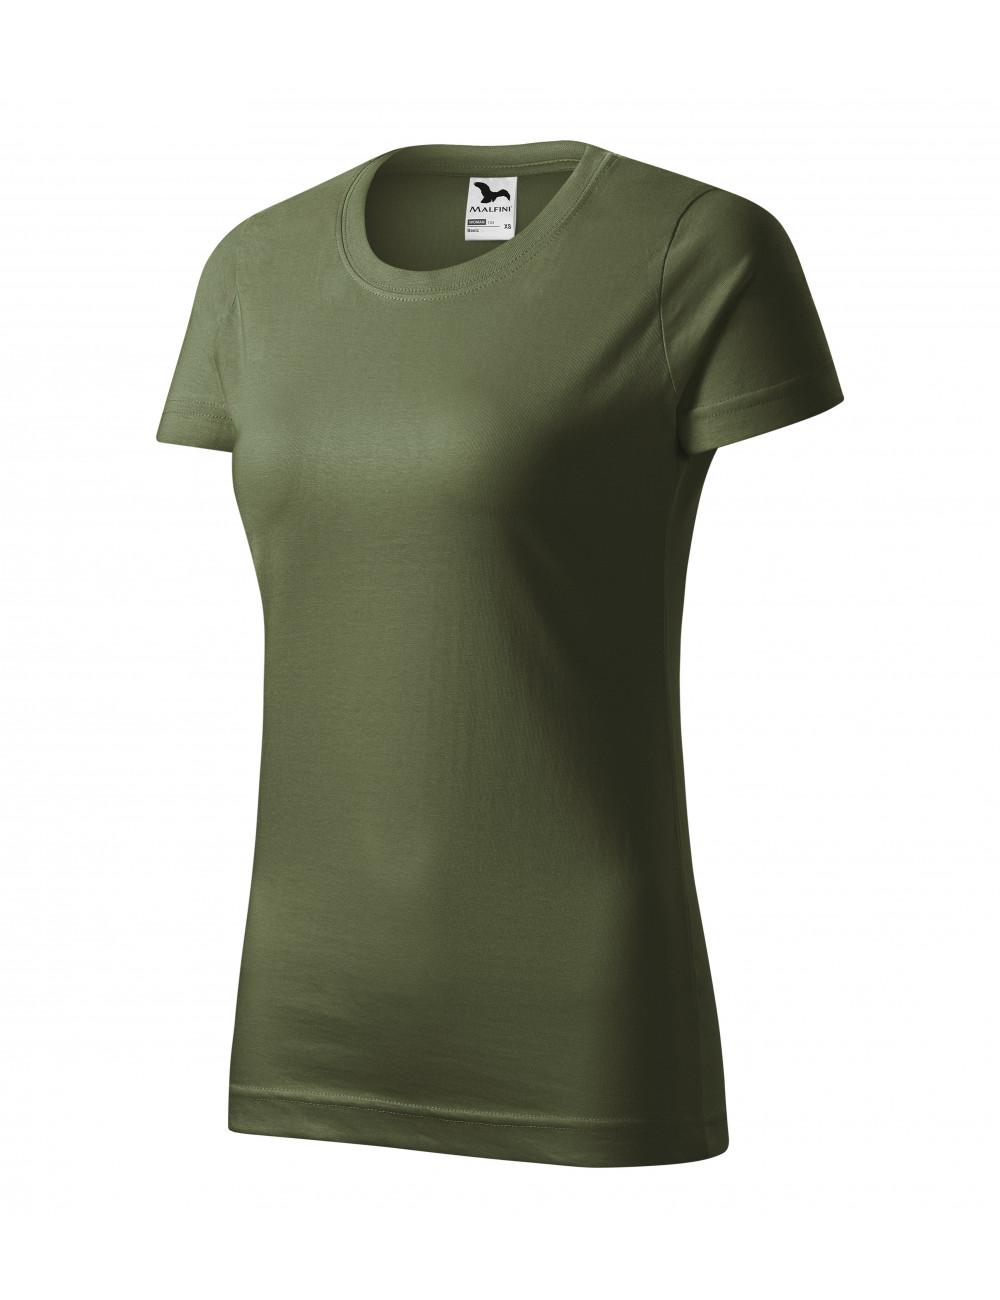 Adler MALFINI Koszulka damska Basic 134 khaki